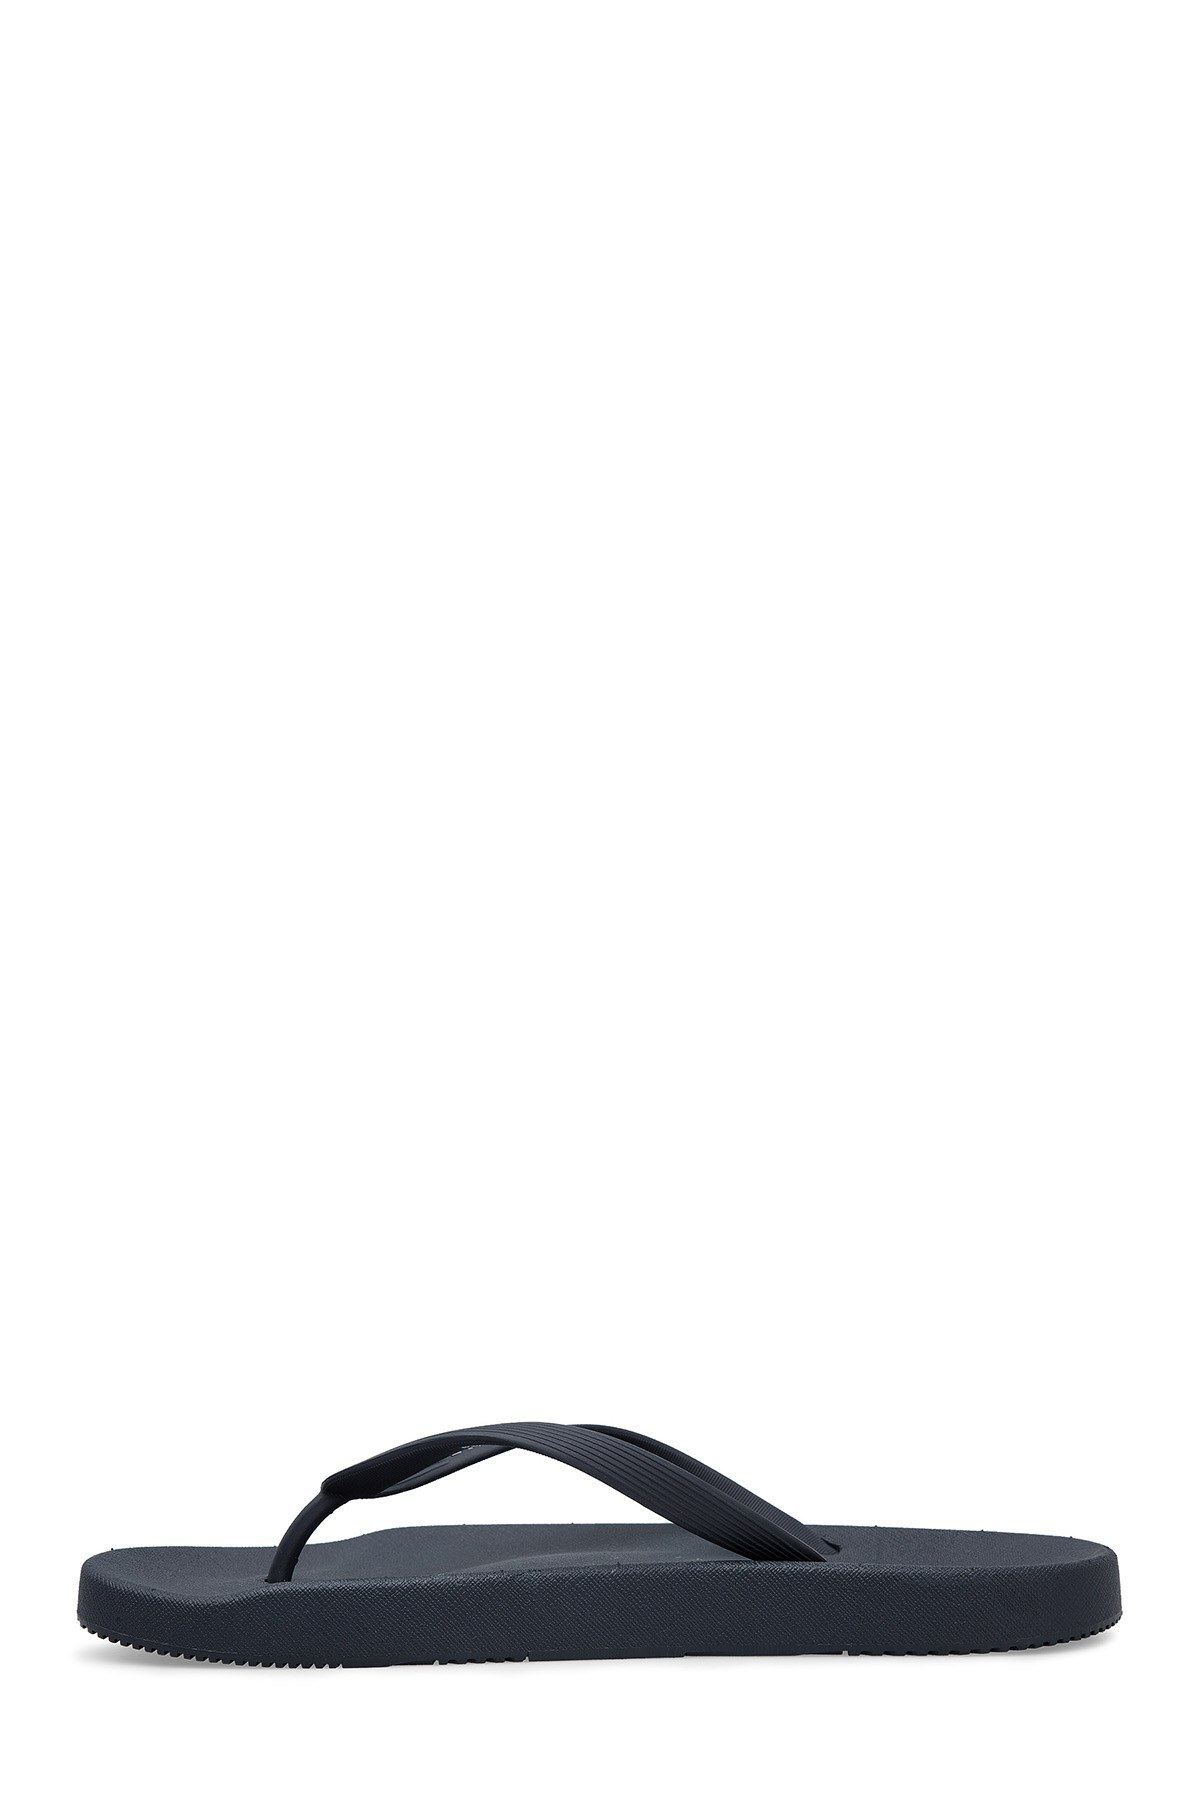 Emporio Armani Erkek Terlik X4QS03 XM290 N151 LACİVERT-LACİVERT